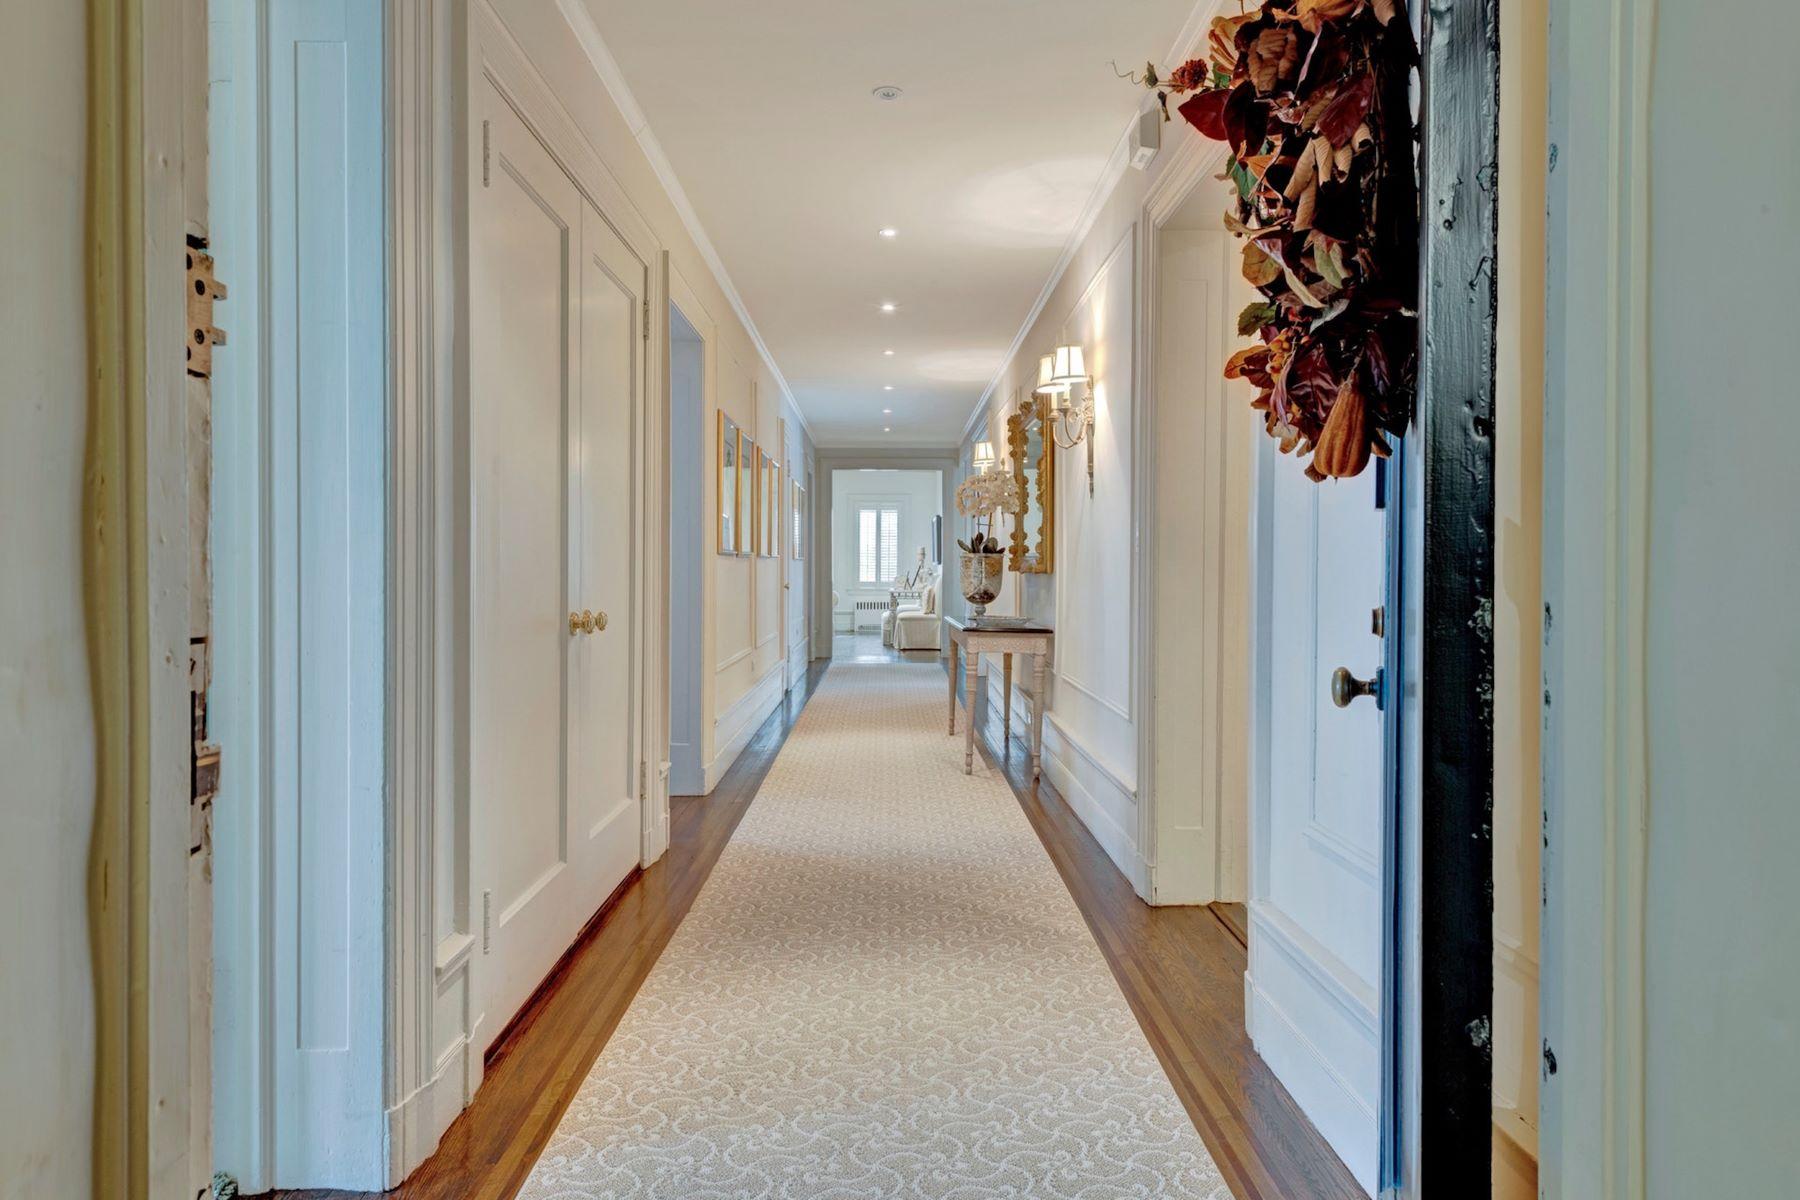 Co-op Properties 為 出售 在 1 Southgate #4C 1 Southgate Unit #4C, Bronxville, 纽约 10708 美國